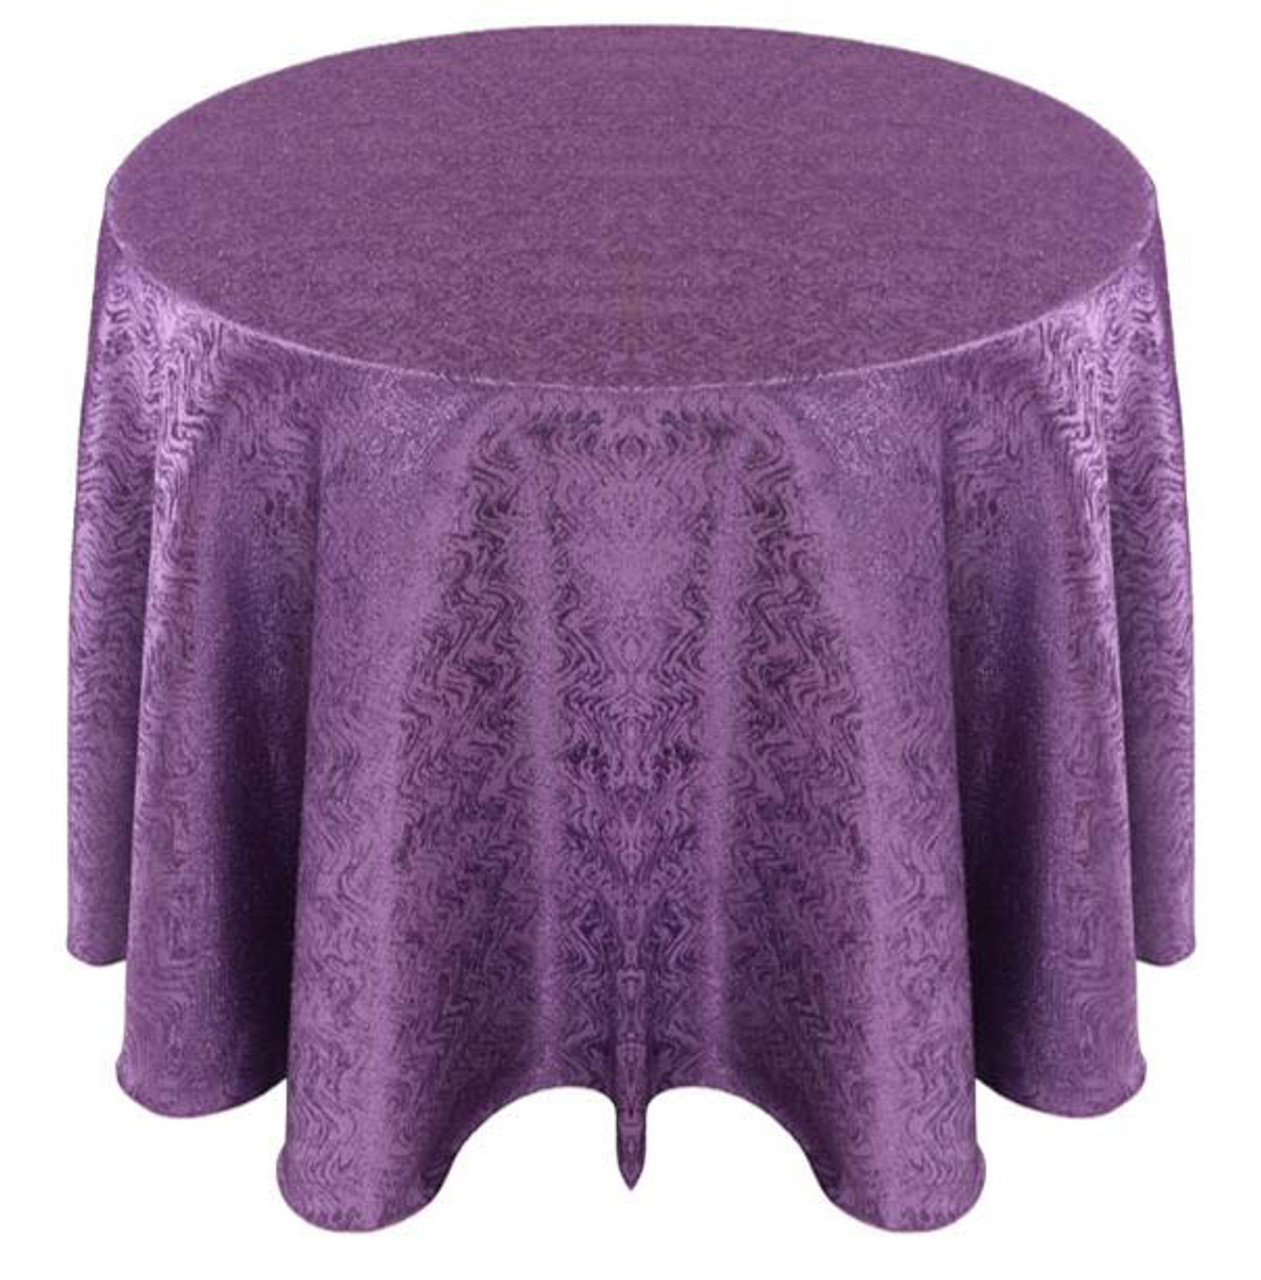 ... Cabaret Taffeta Tablecloth Linen Purple ...